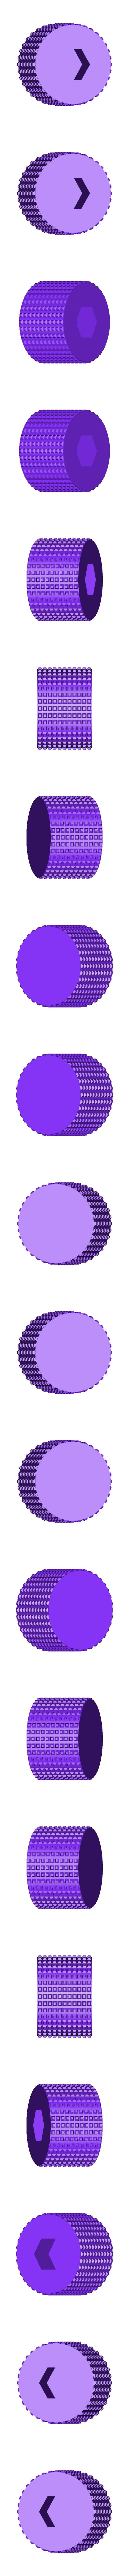 Filament-Spool-Mount-Universal_-_Knob.stl Download free STL file Filament Spool Holder - Bearings and custom width • 3D print design, csigshoj